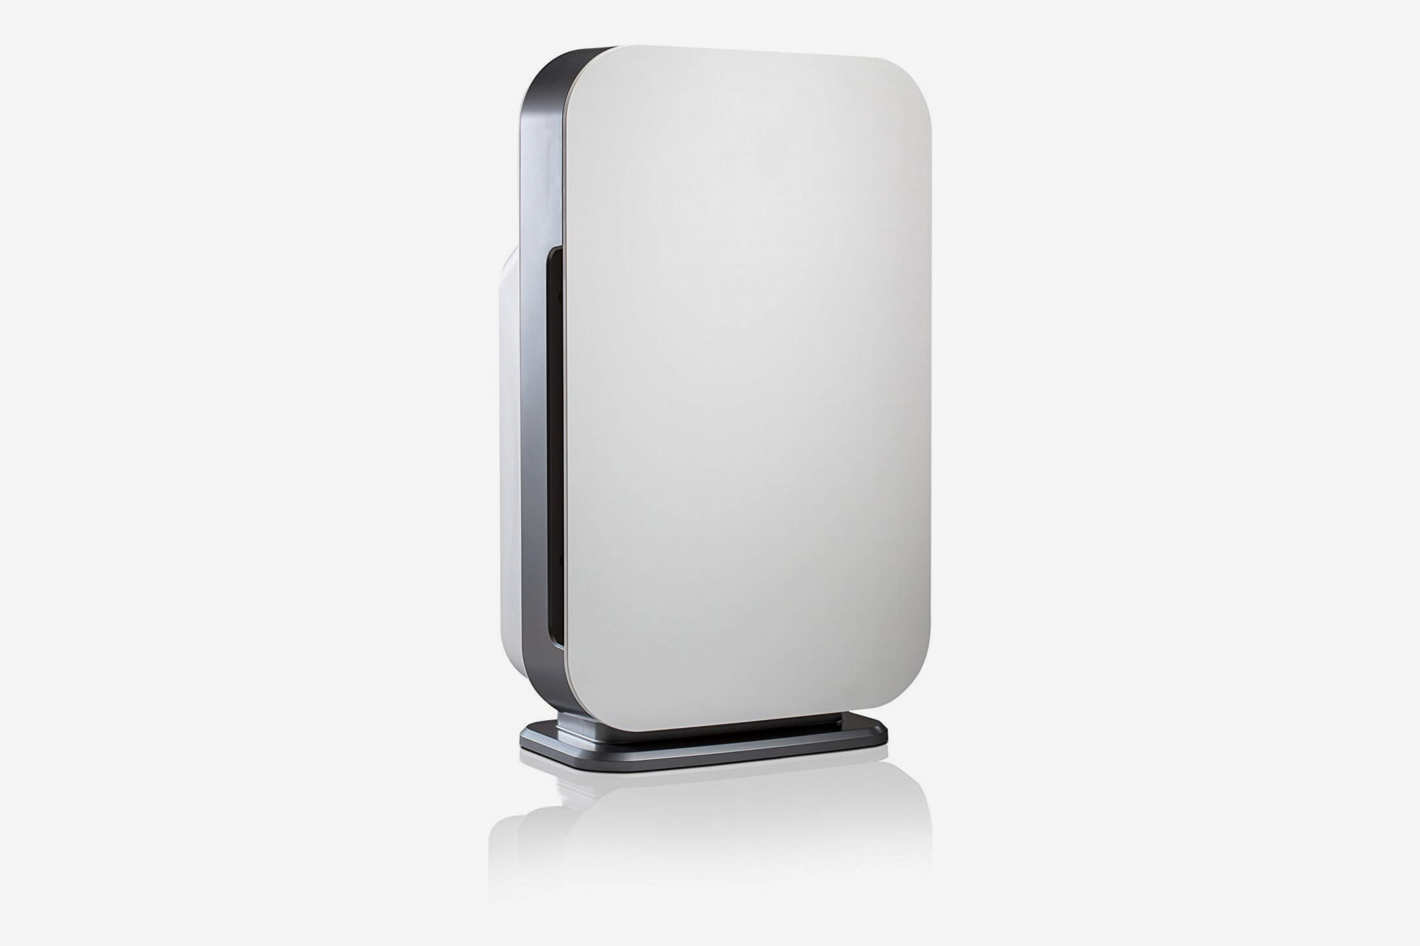 Alen BreatheSmart FLEX Air Purifier with Filter for Mold & Bacteria